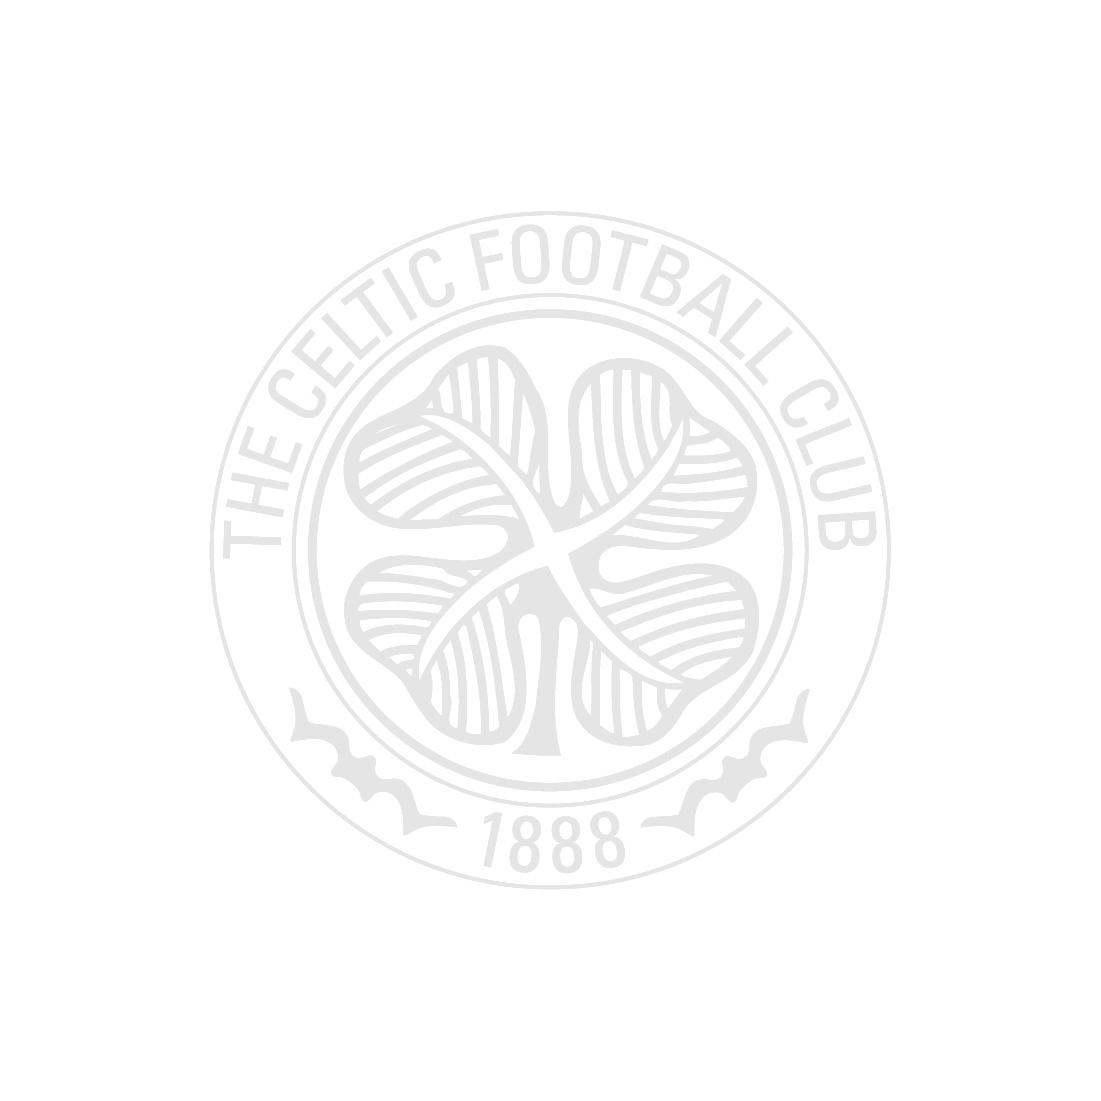 Celtics Established 1888 Graphic T-shirt